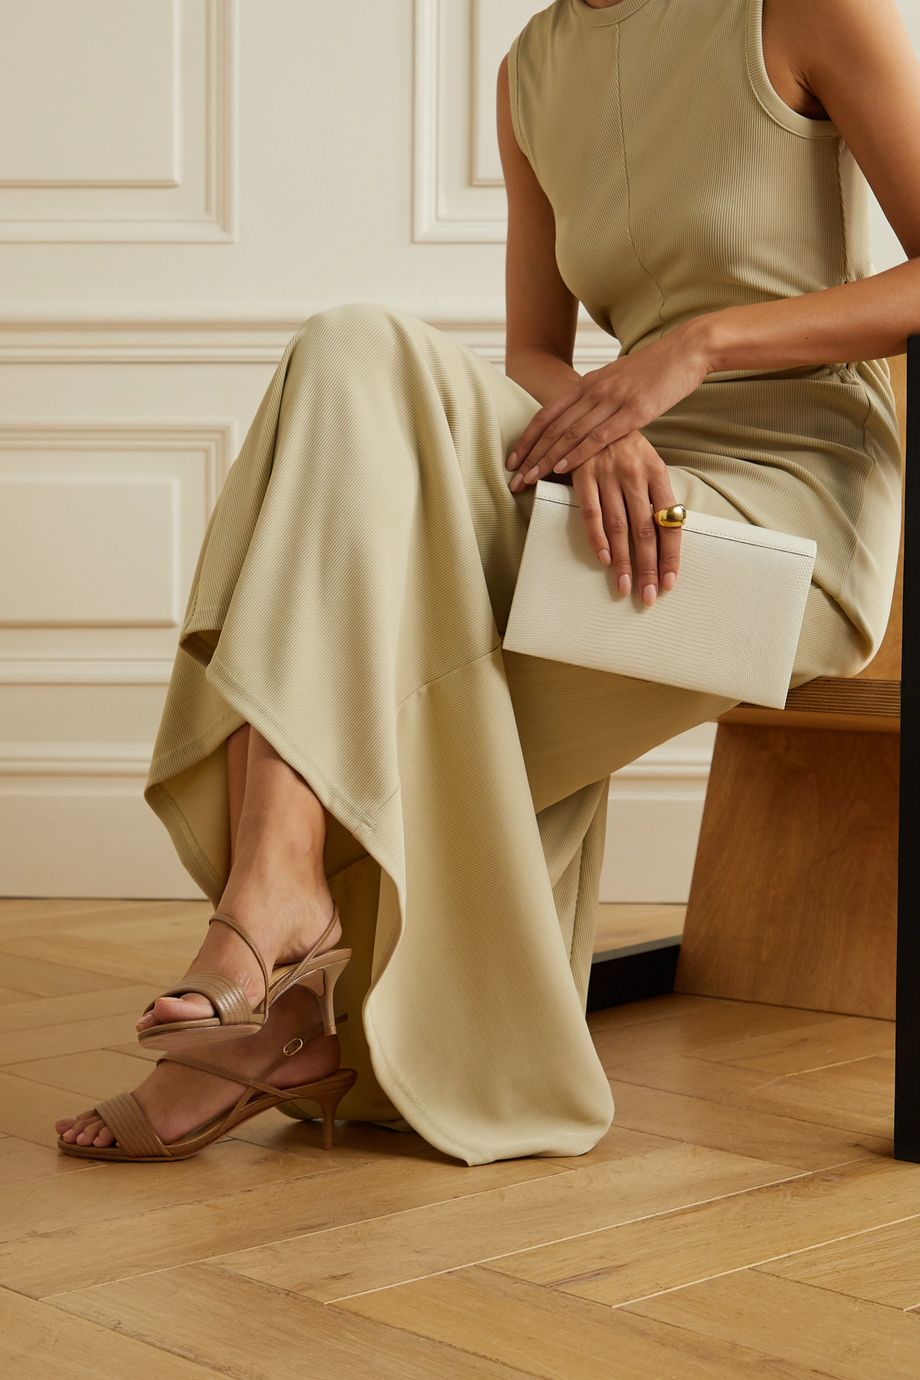 Alexandre Birman Veronica 皮革凉鞋